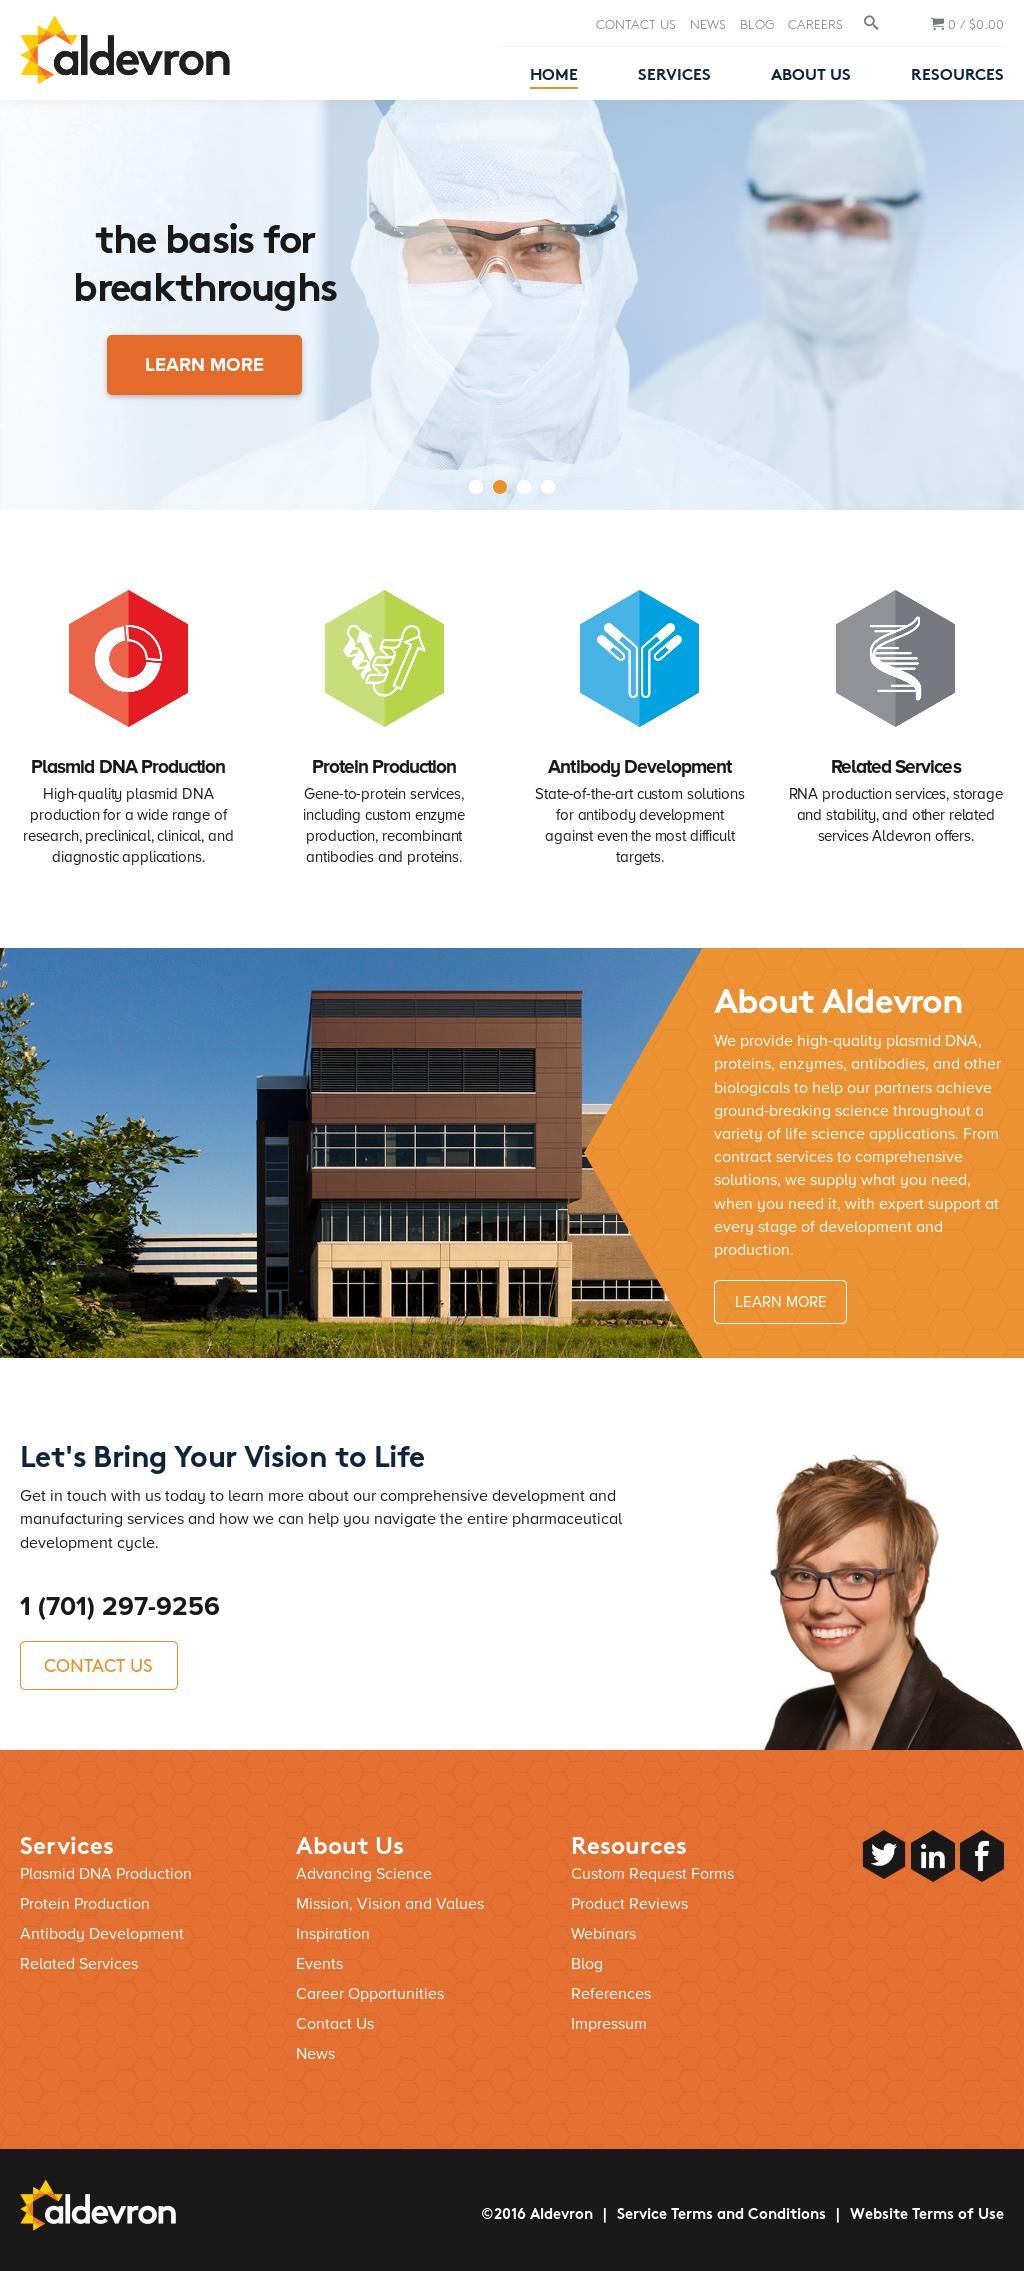 Aldevron Competitors, Revenue and Employees - Owler Company